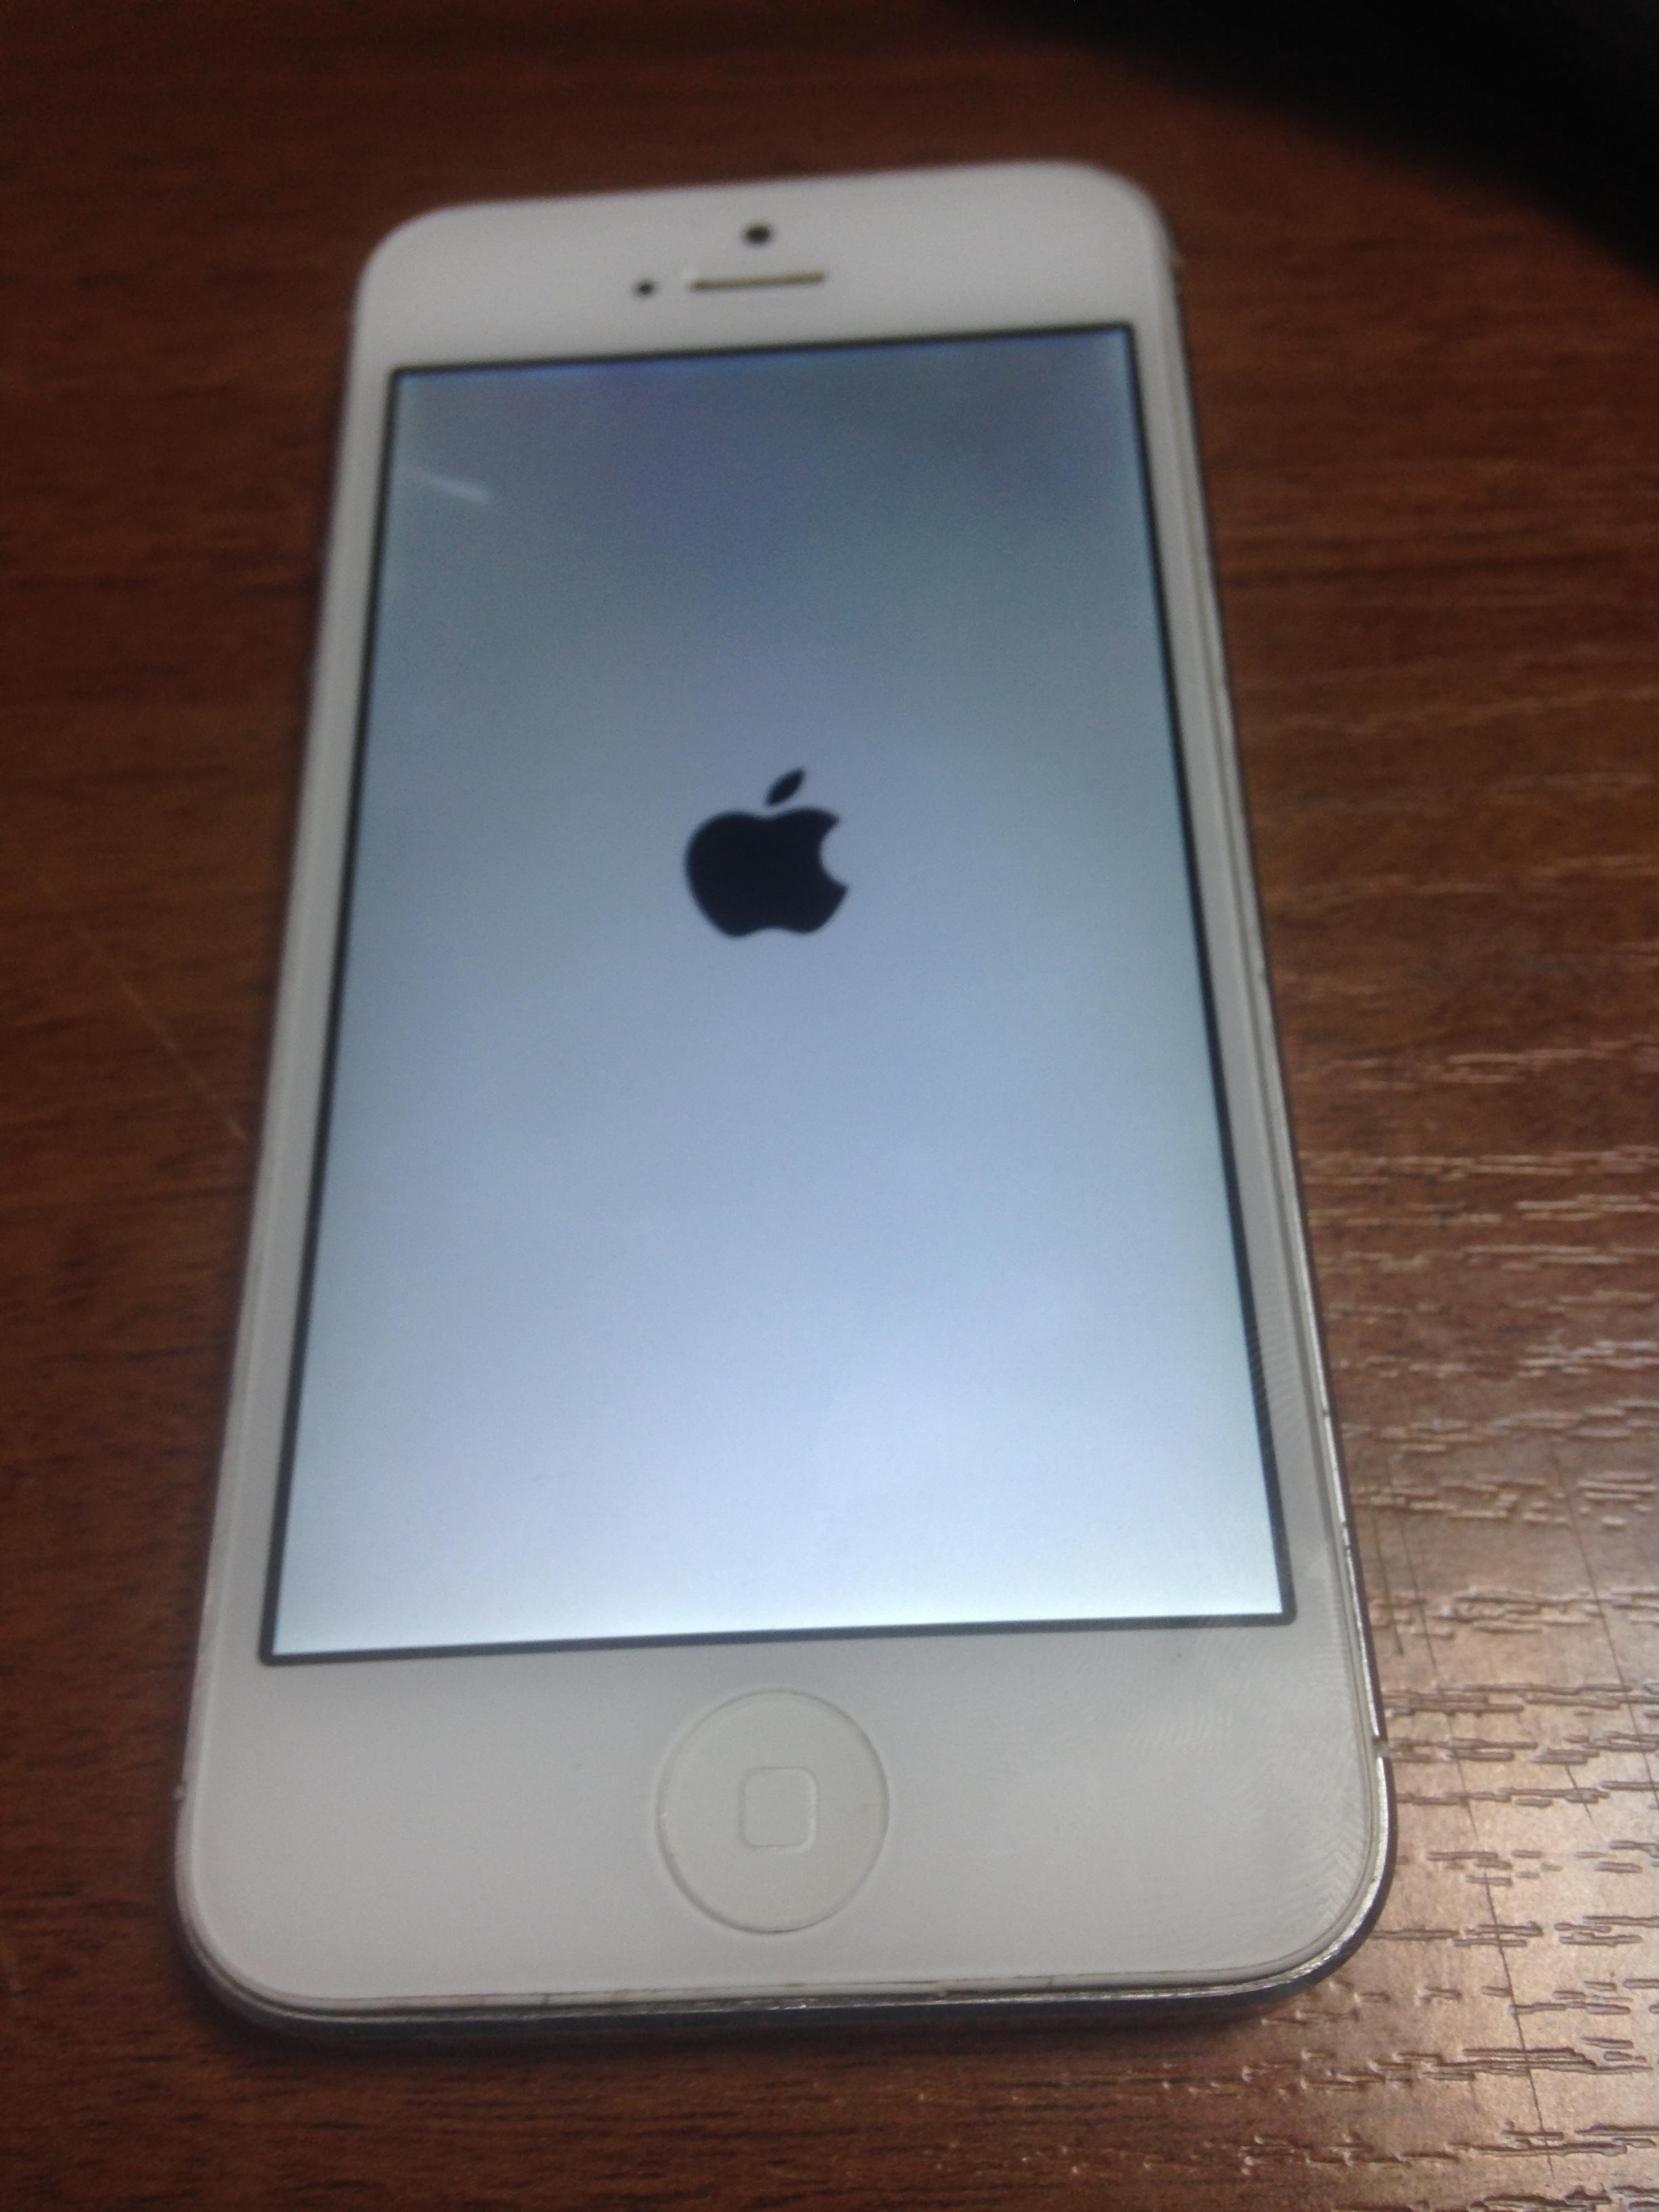 iphone 5-1 (2)